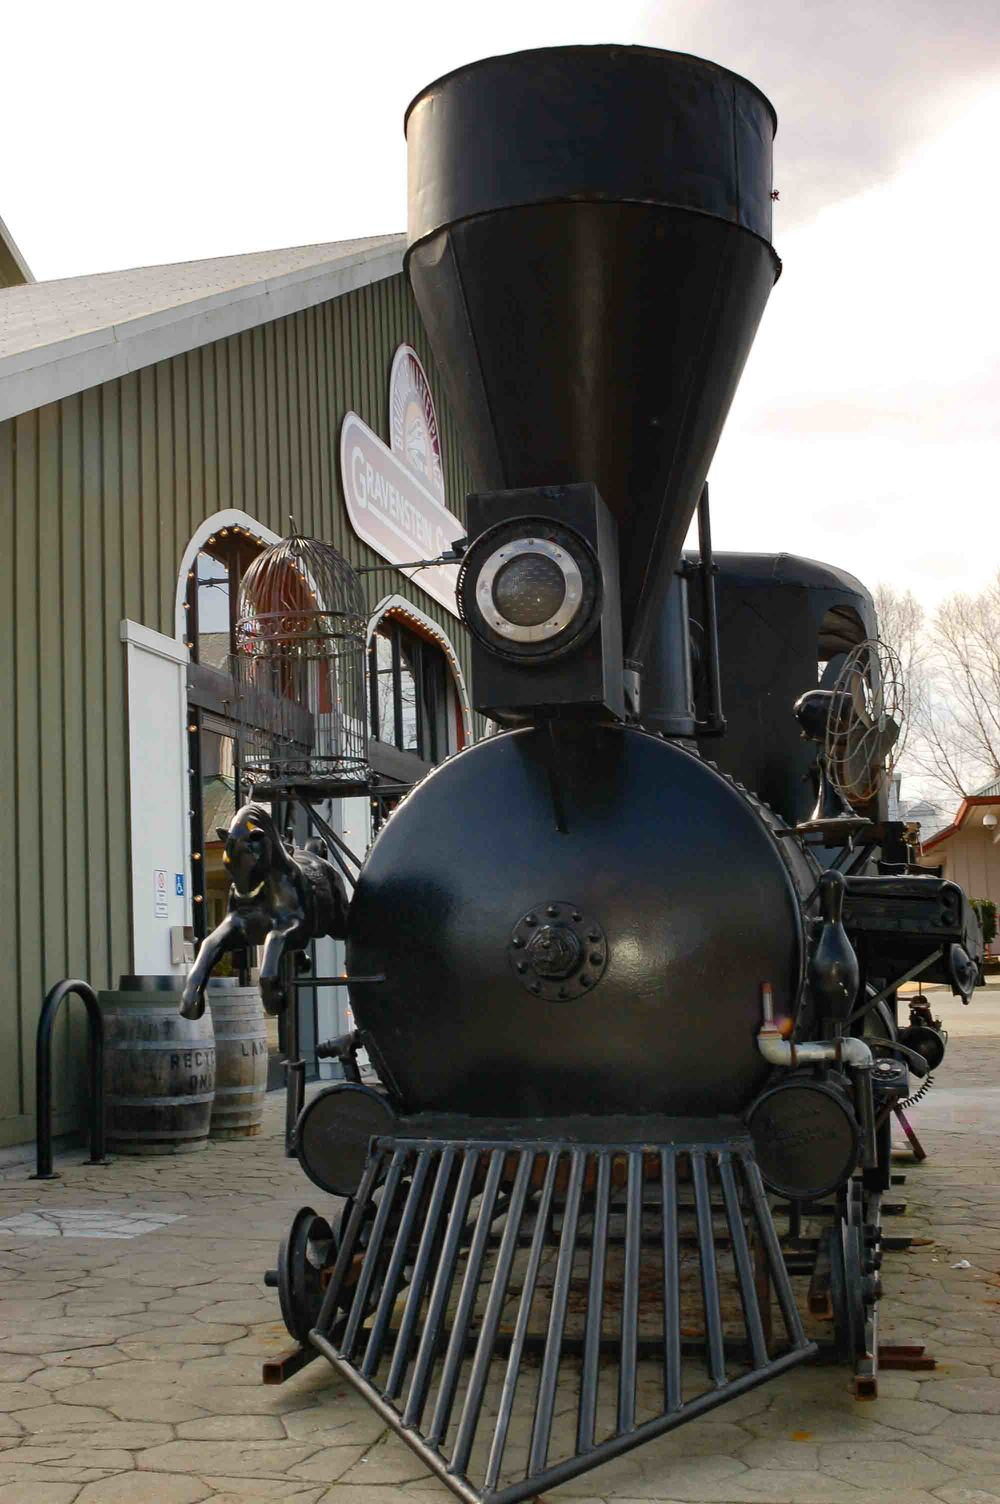 The Great Locomotive